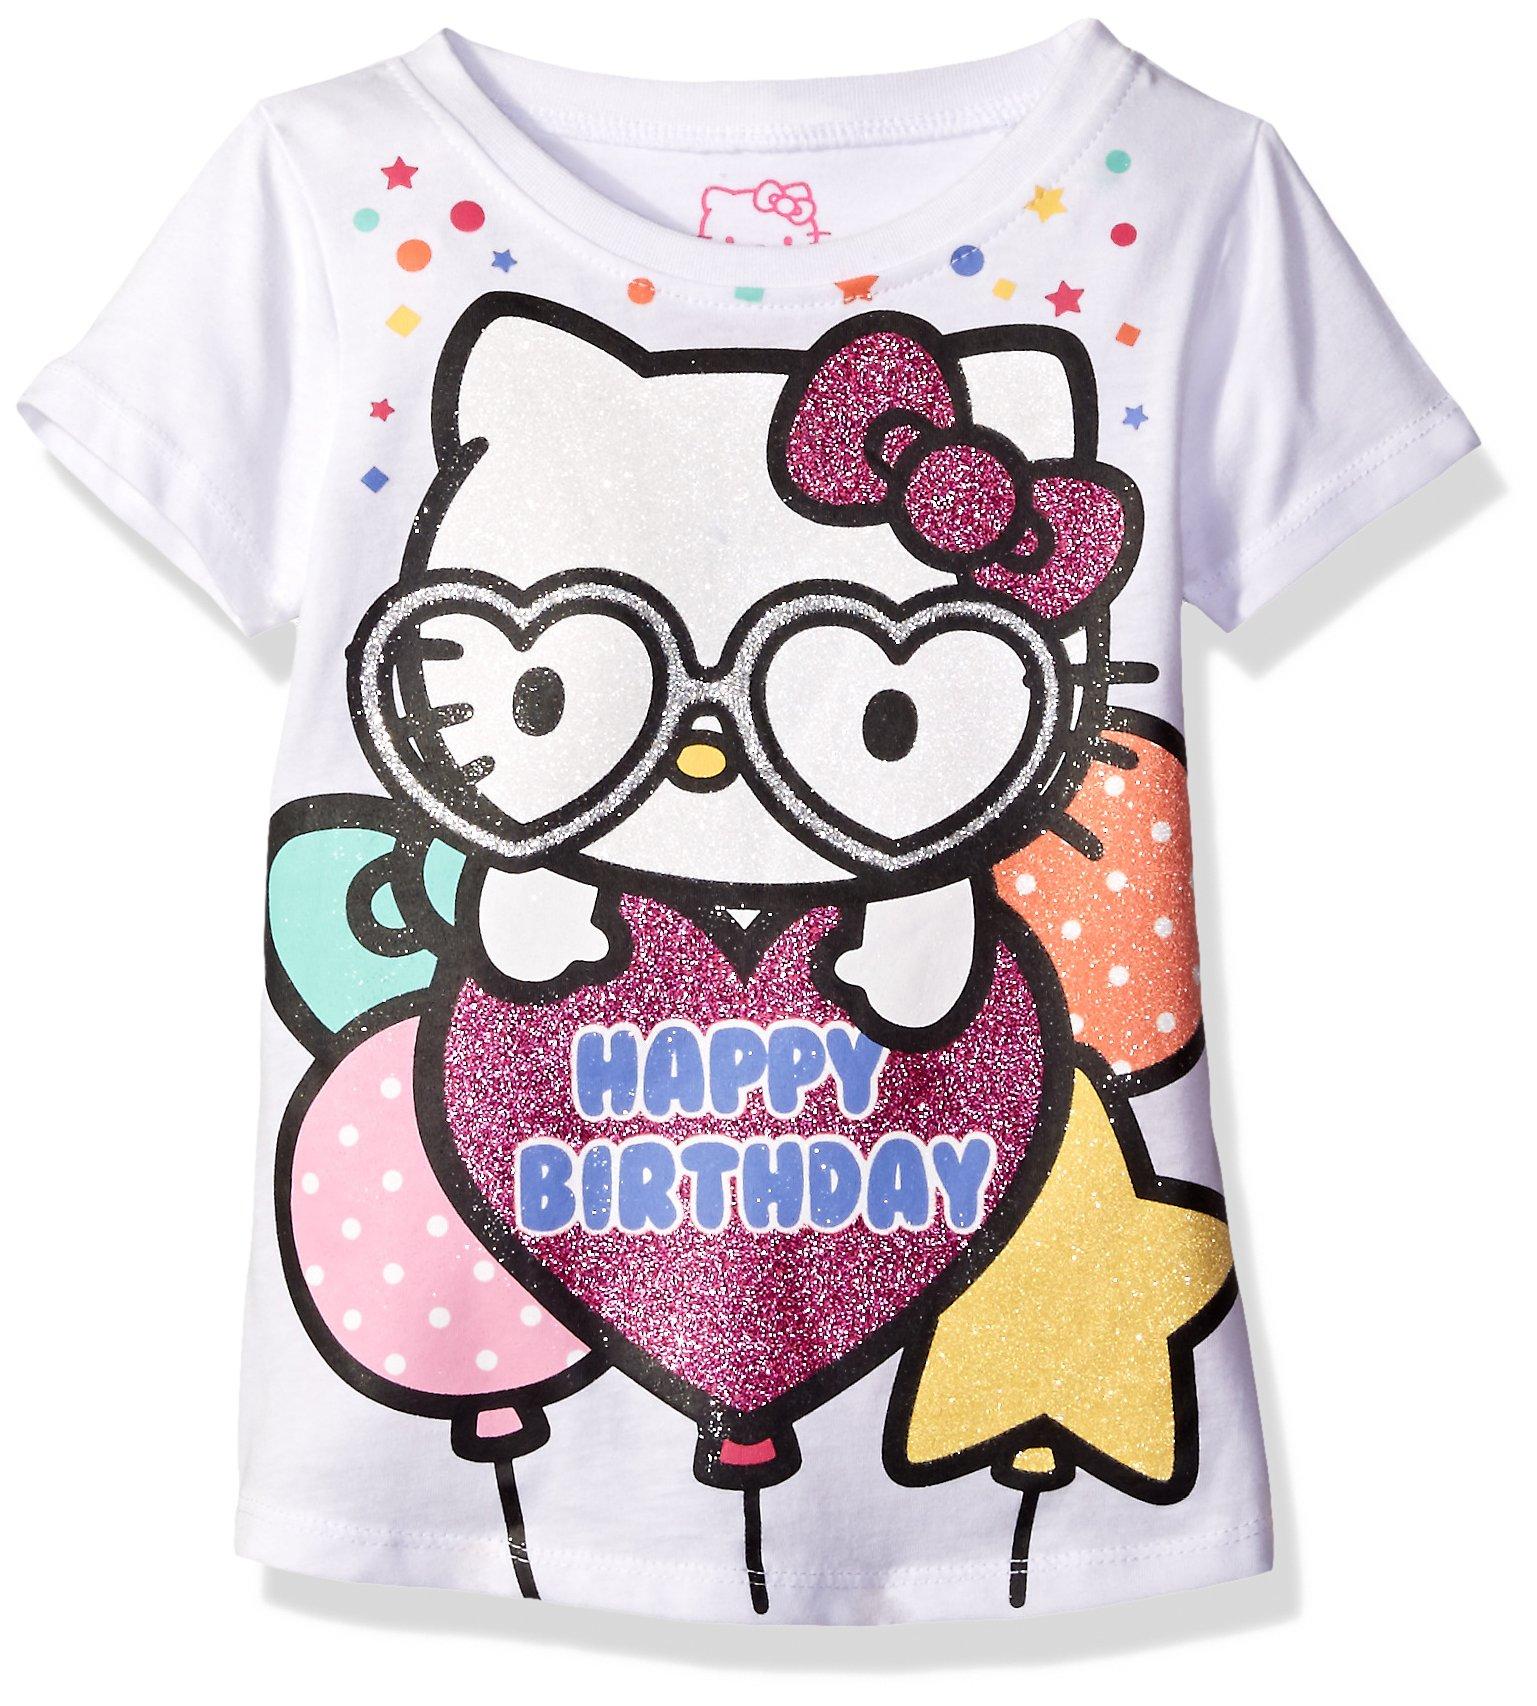 Hello Kitty Girls' Little Girls' Happy Birthday T-Shirt, White, 6X